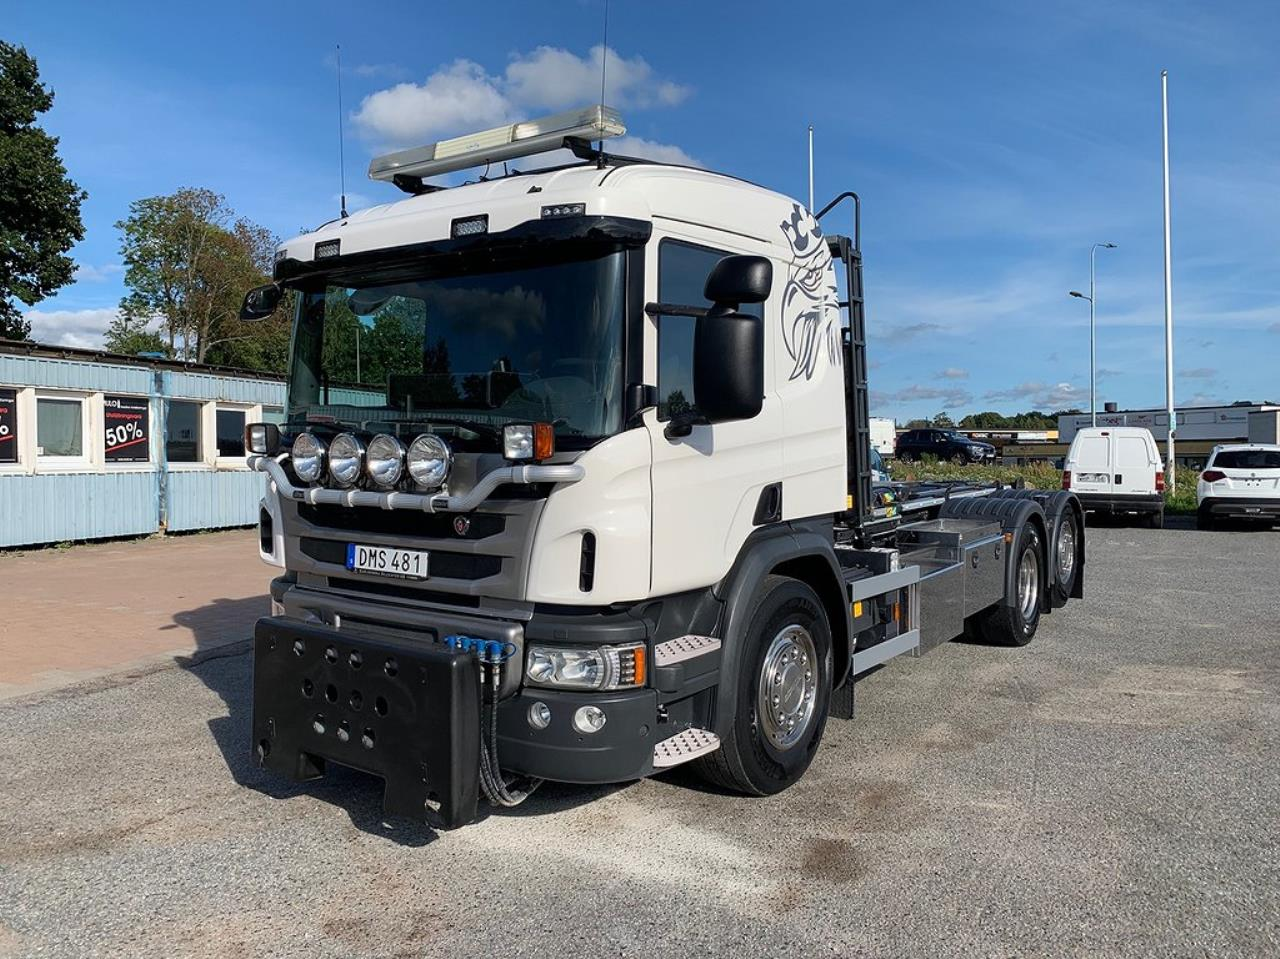 Scania P450 6x2*4 Lastväxlare Plogutrustad 2017 - Krok/Lastväxlare